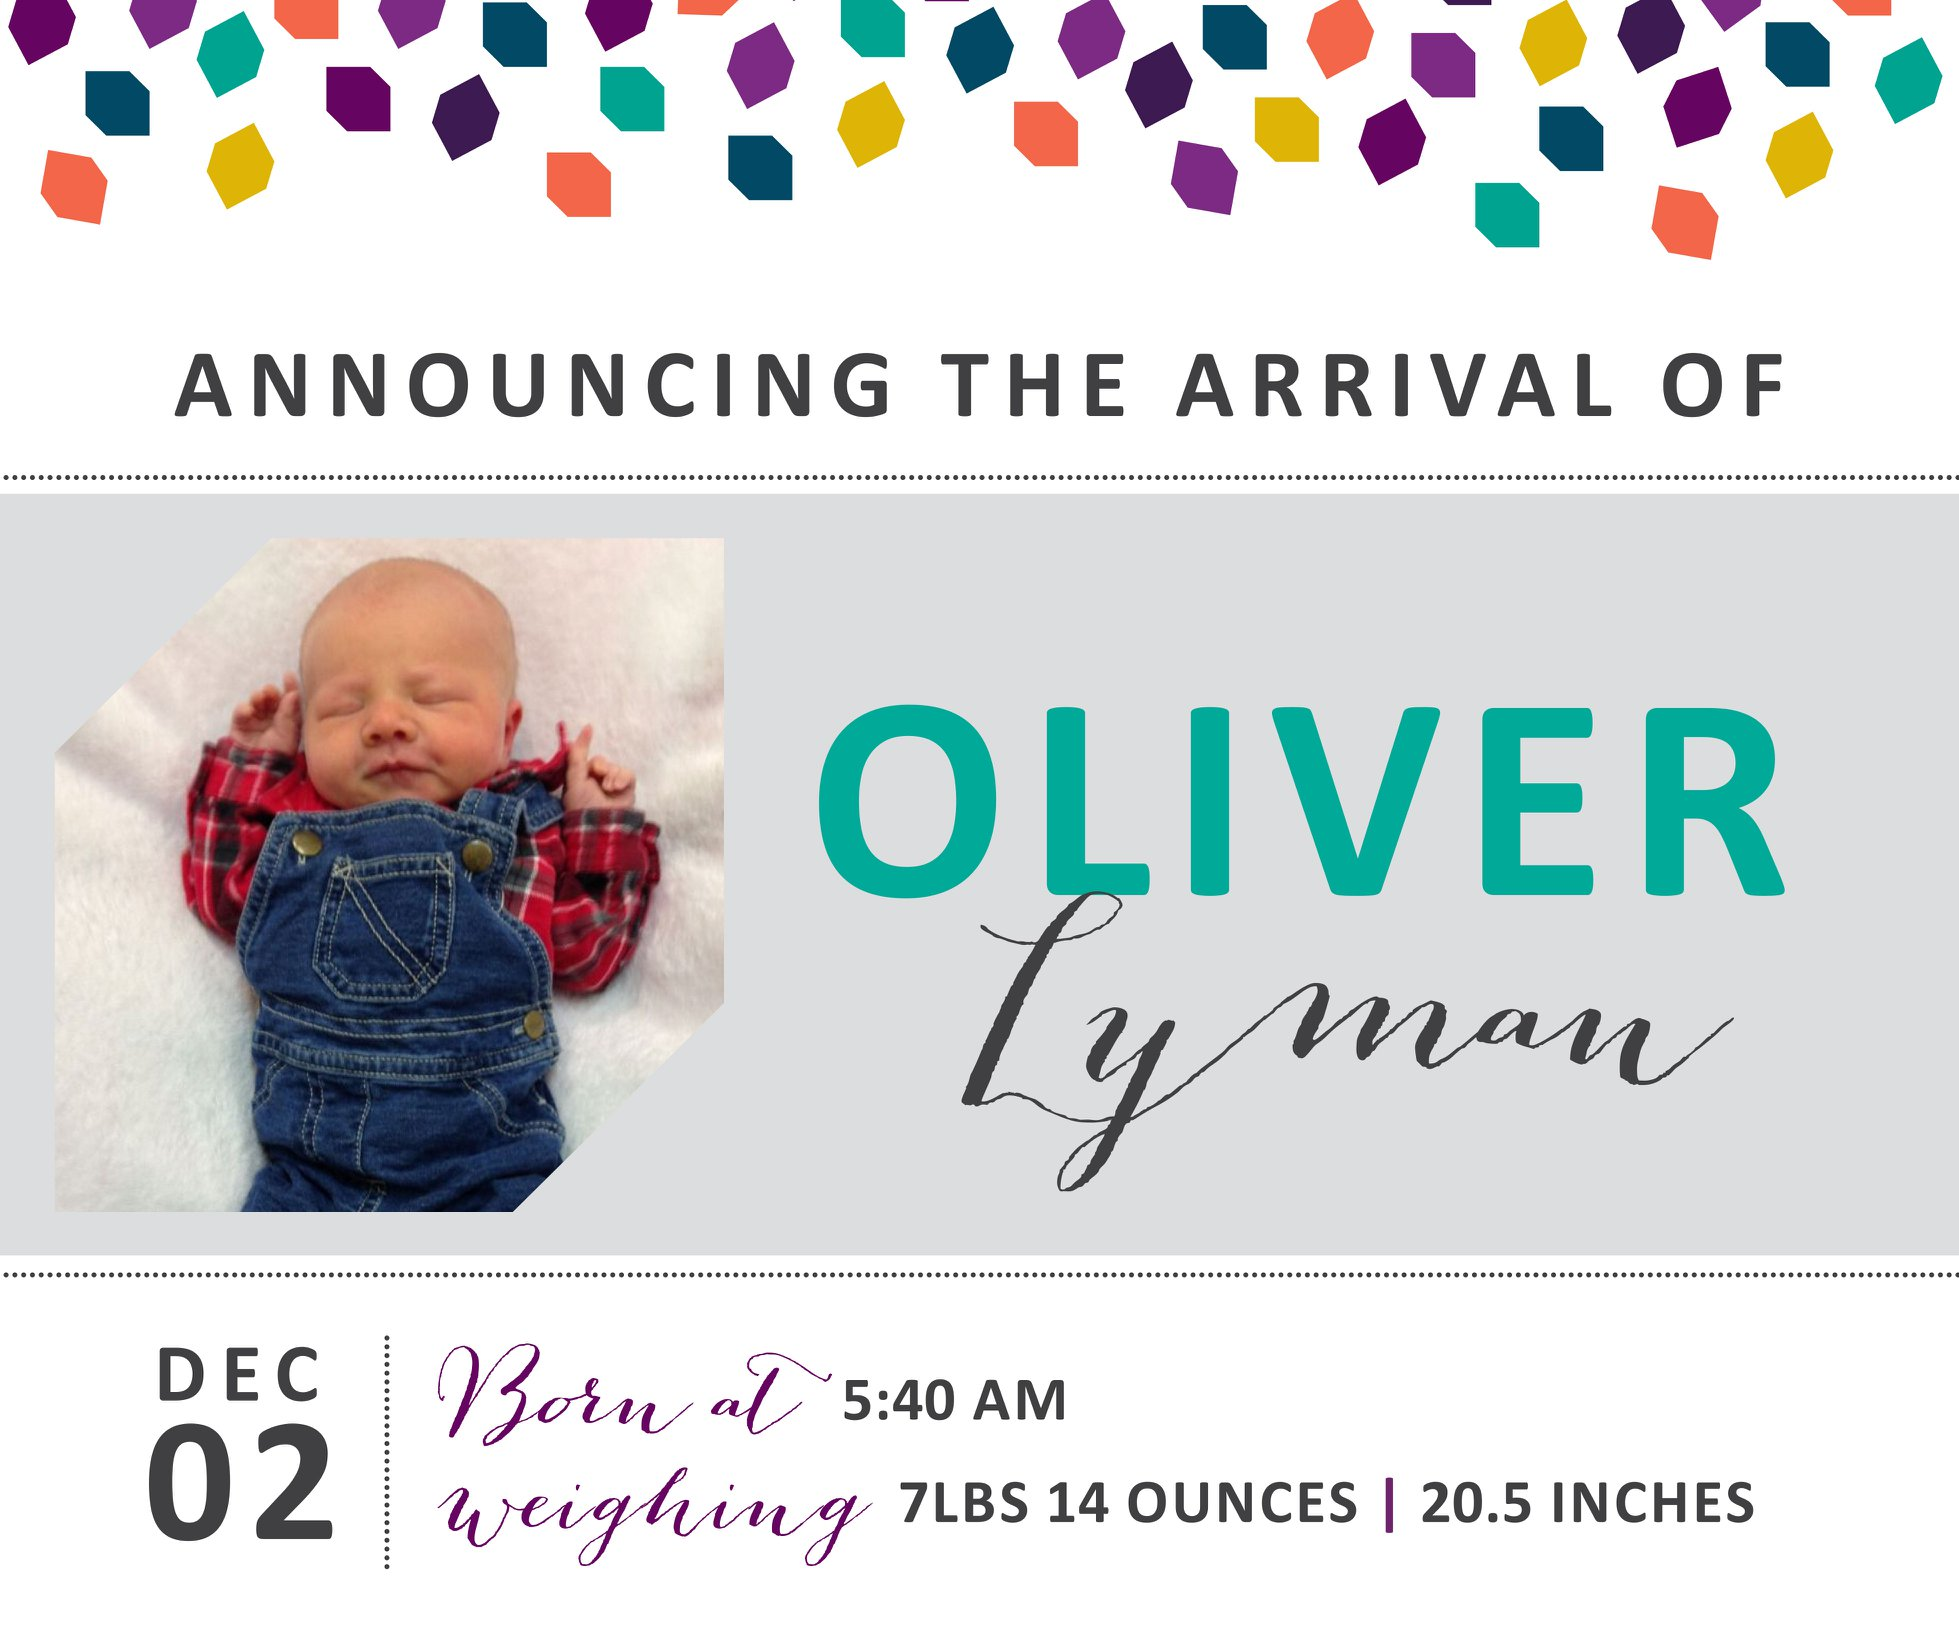 Oliver Lyman 1